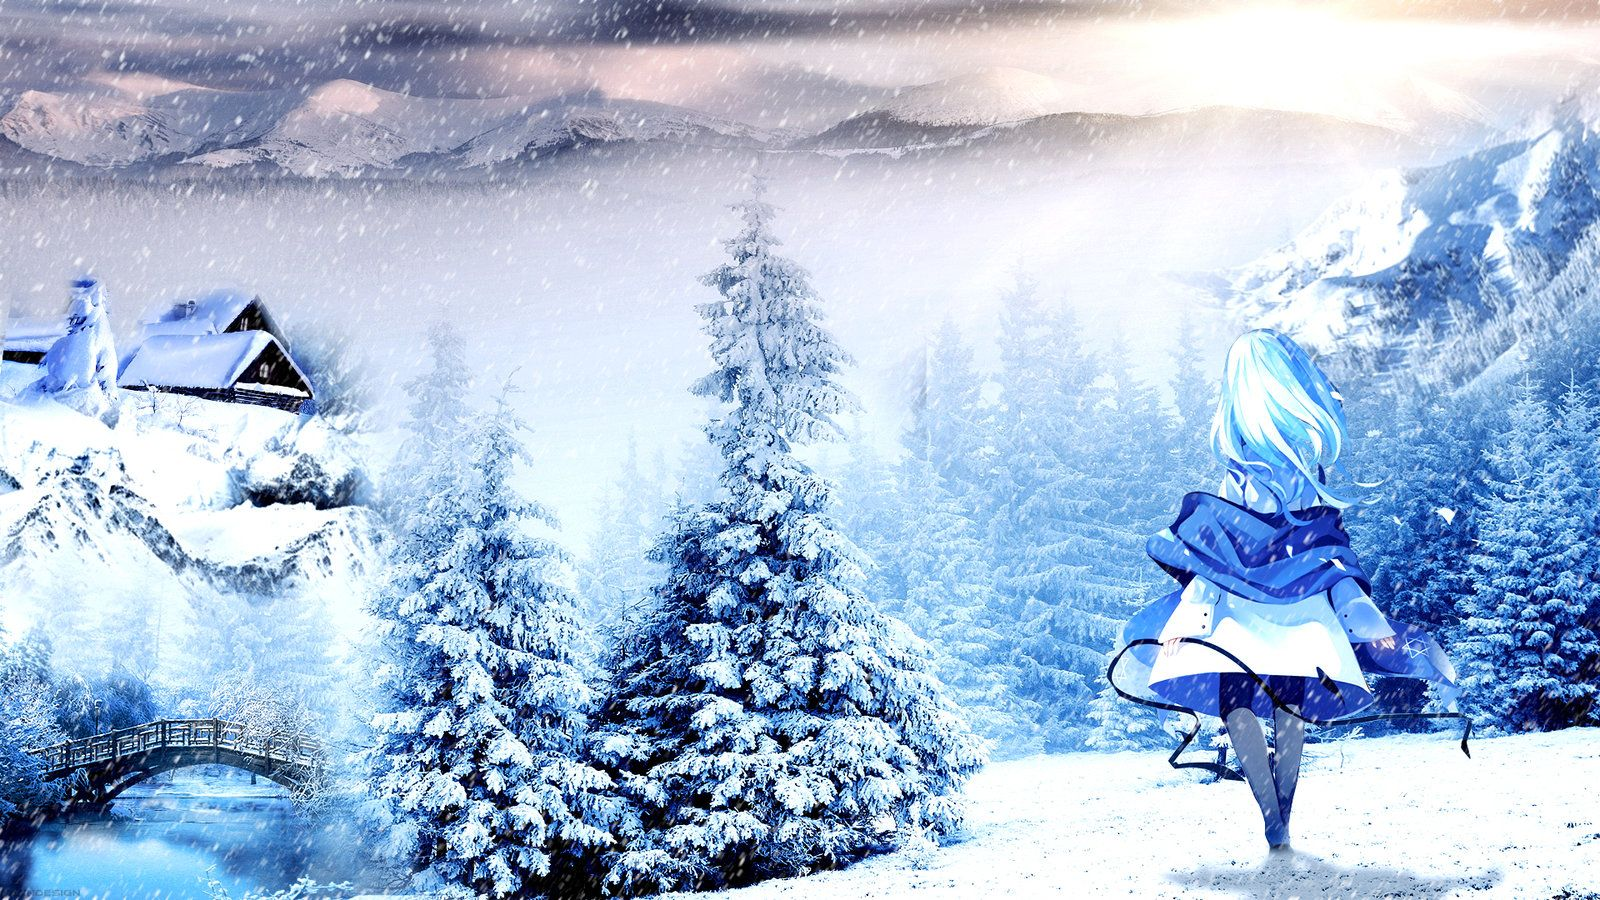 Anime winter scenery wallpaper - Anime scenery wallpaper laptop ...